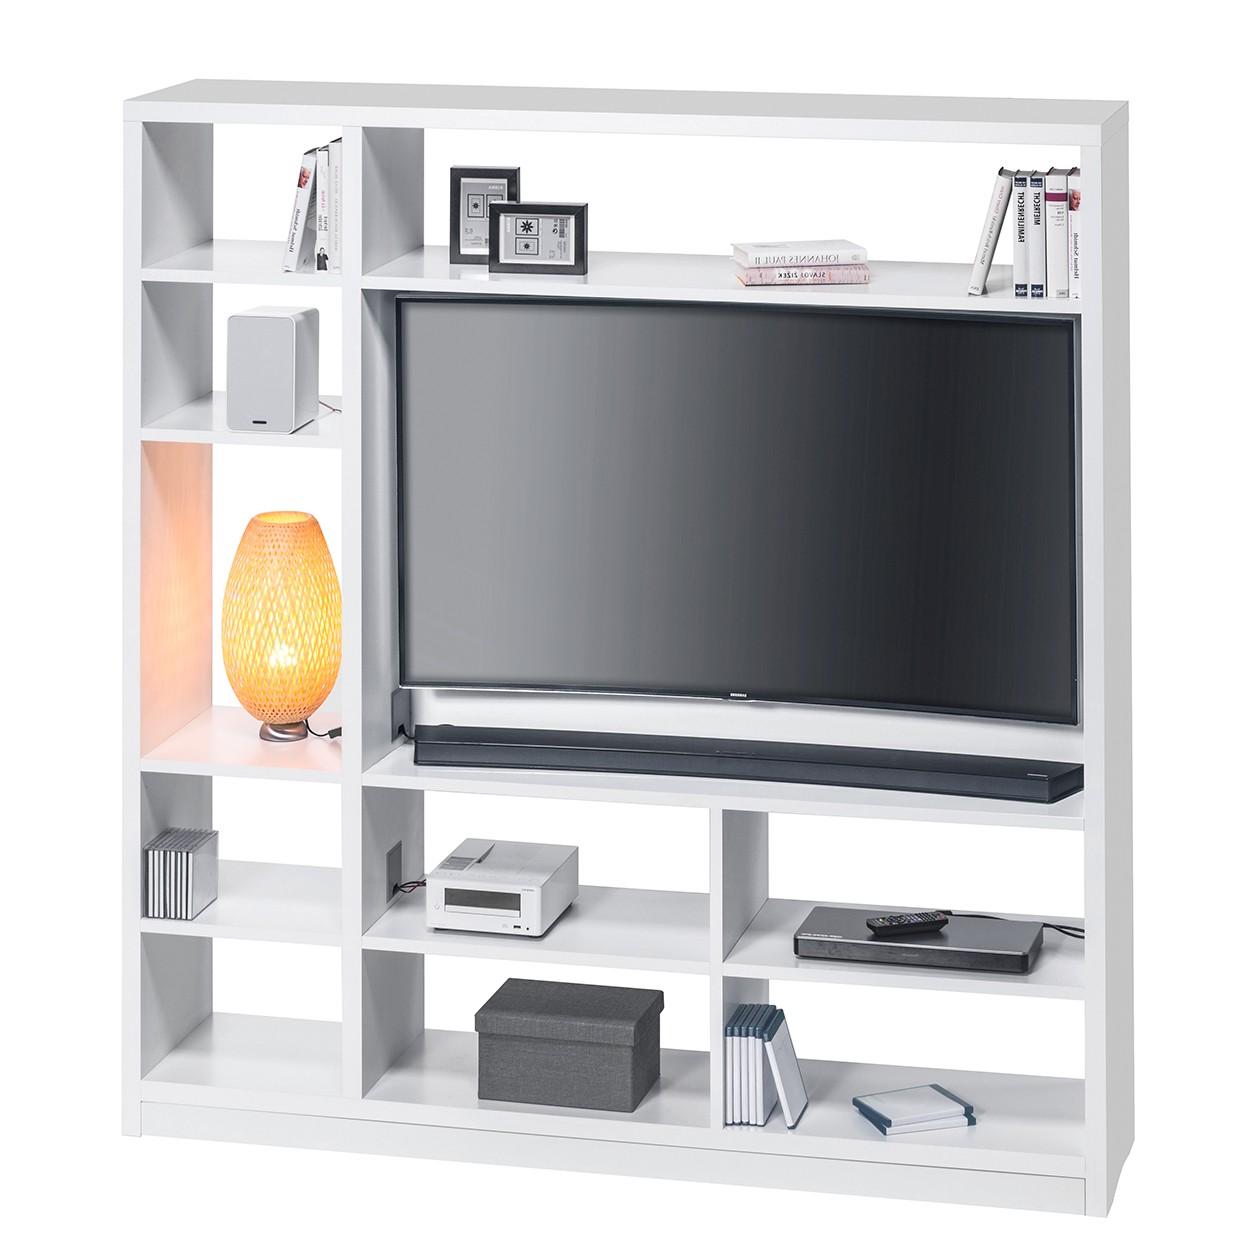 regal cableboard iii wei maja m bel g nstig online kaufen. Black Bedroom Furniture Sets. Home Design Ideas